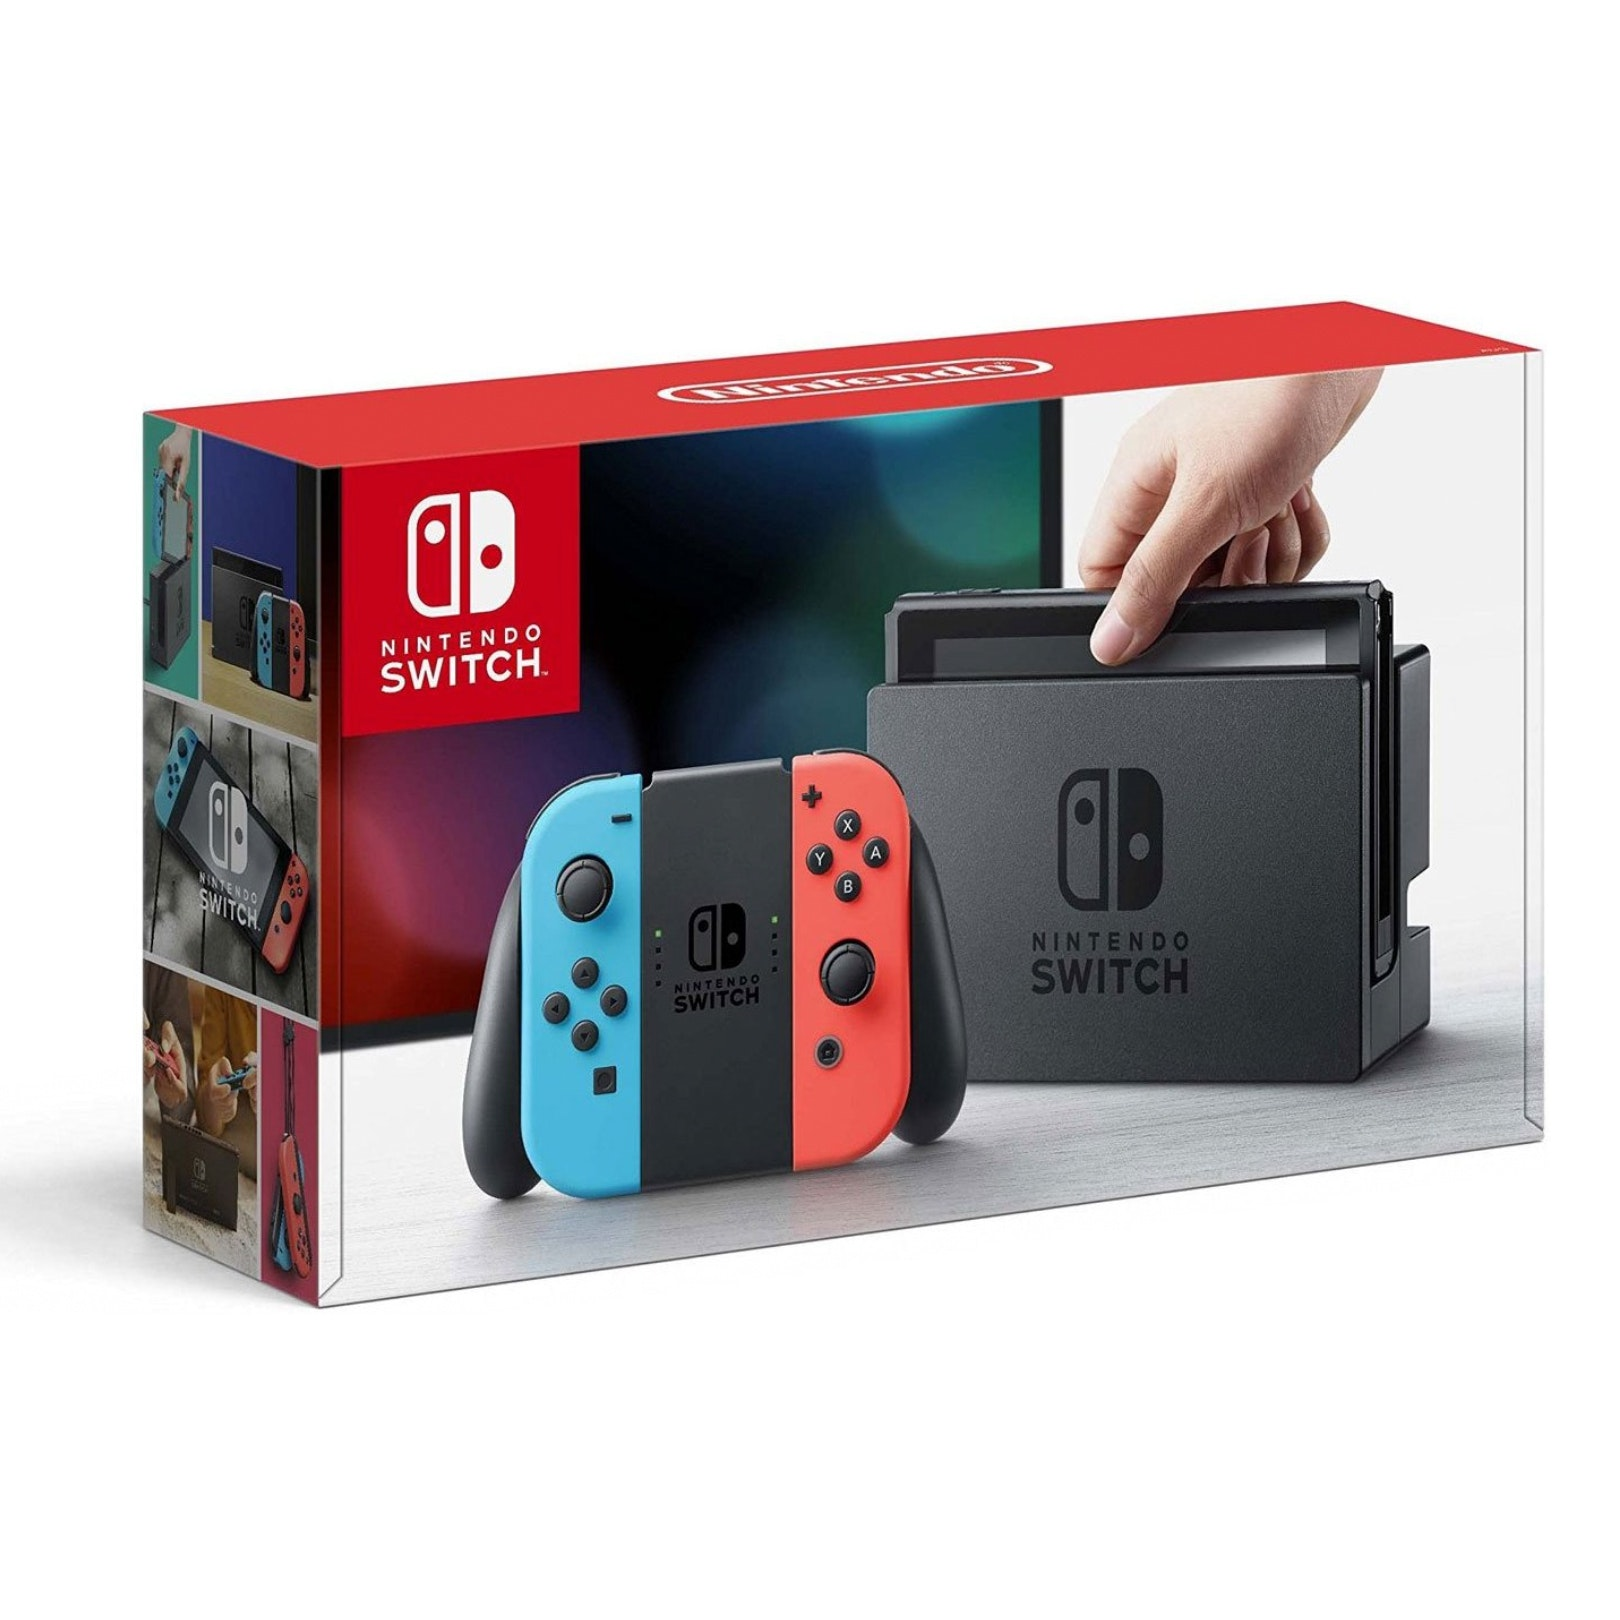 Nintindo Switch amazon deal